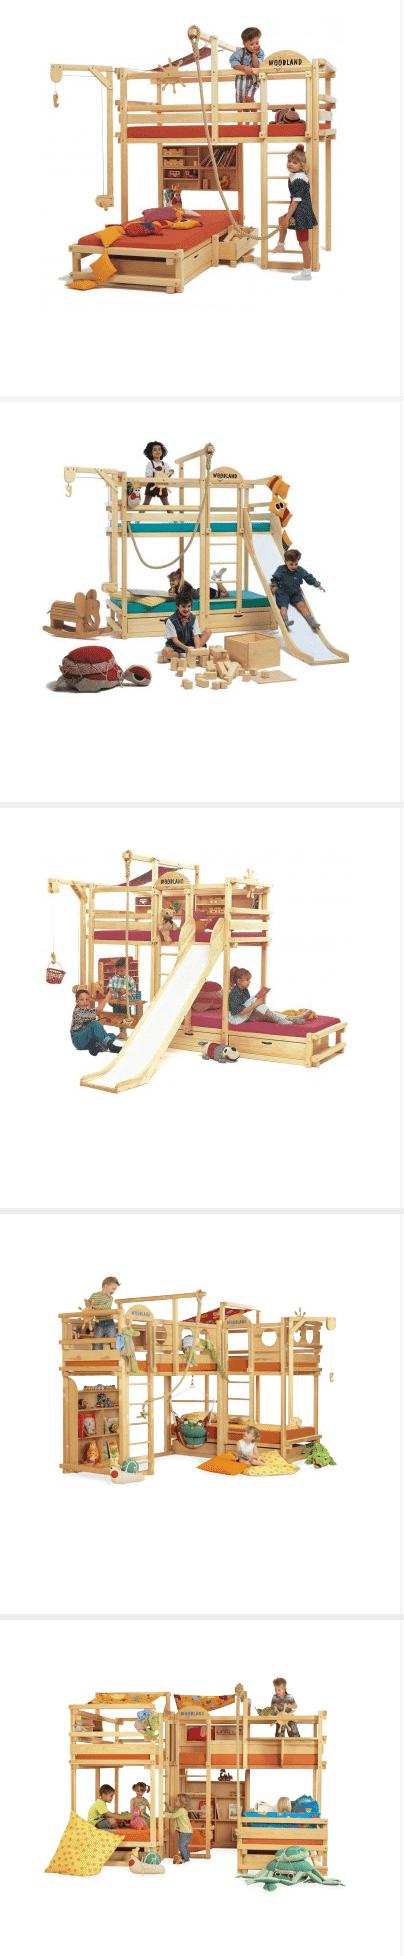 Nicht nur Bett, sondern schon fast Abenteuerspielplatz: Etagenbetten / Hochbetten bei woodland.de (Screenshot https://www.woodland.de/kindermoebel/etagenbetten.html am 10.02.2015)